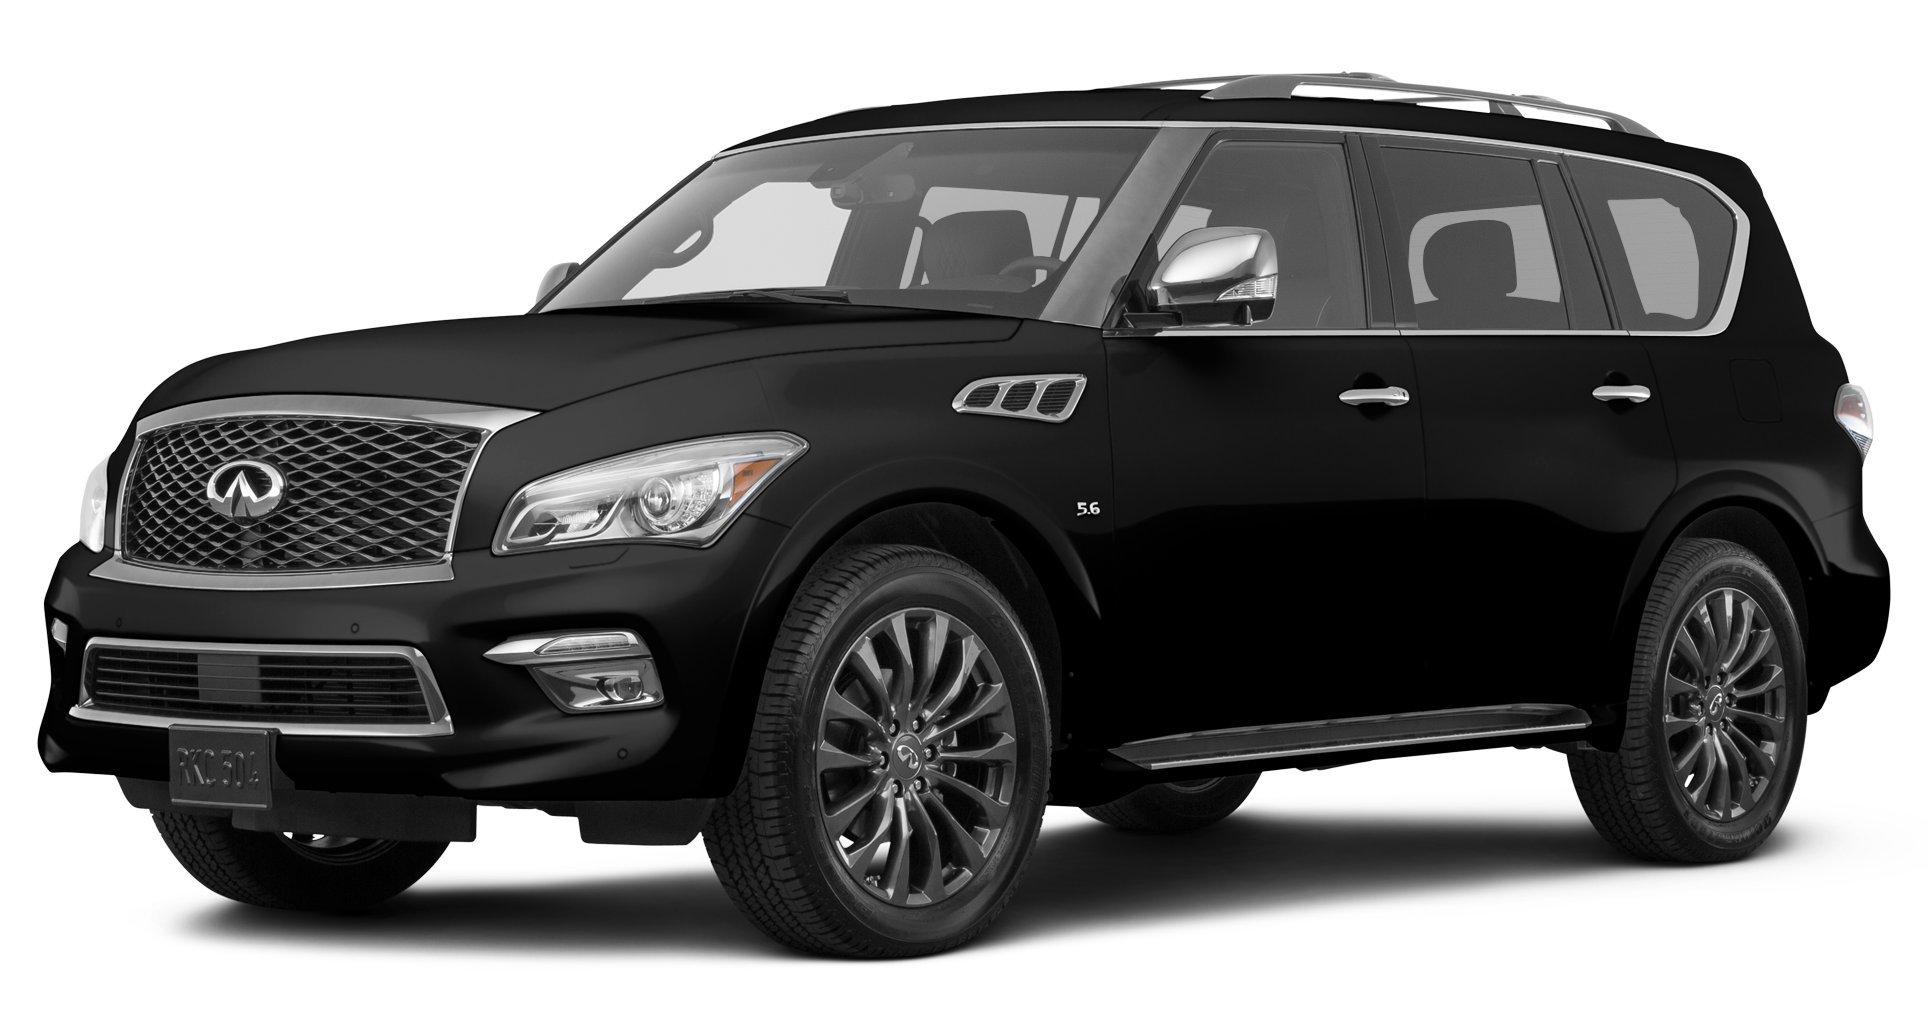 2017 mercedes benz gls550 reviews images and specs vehicles. Black Bedroom Furniture Sets. Home Design Ideas